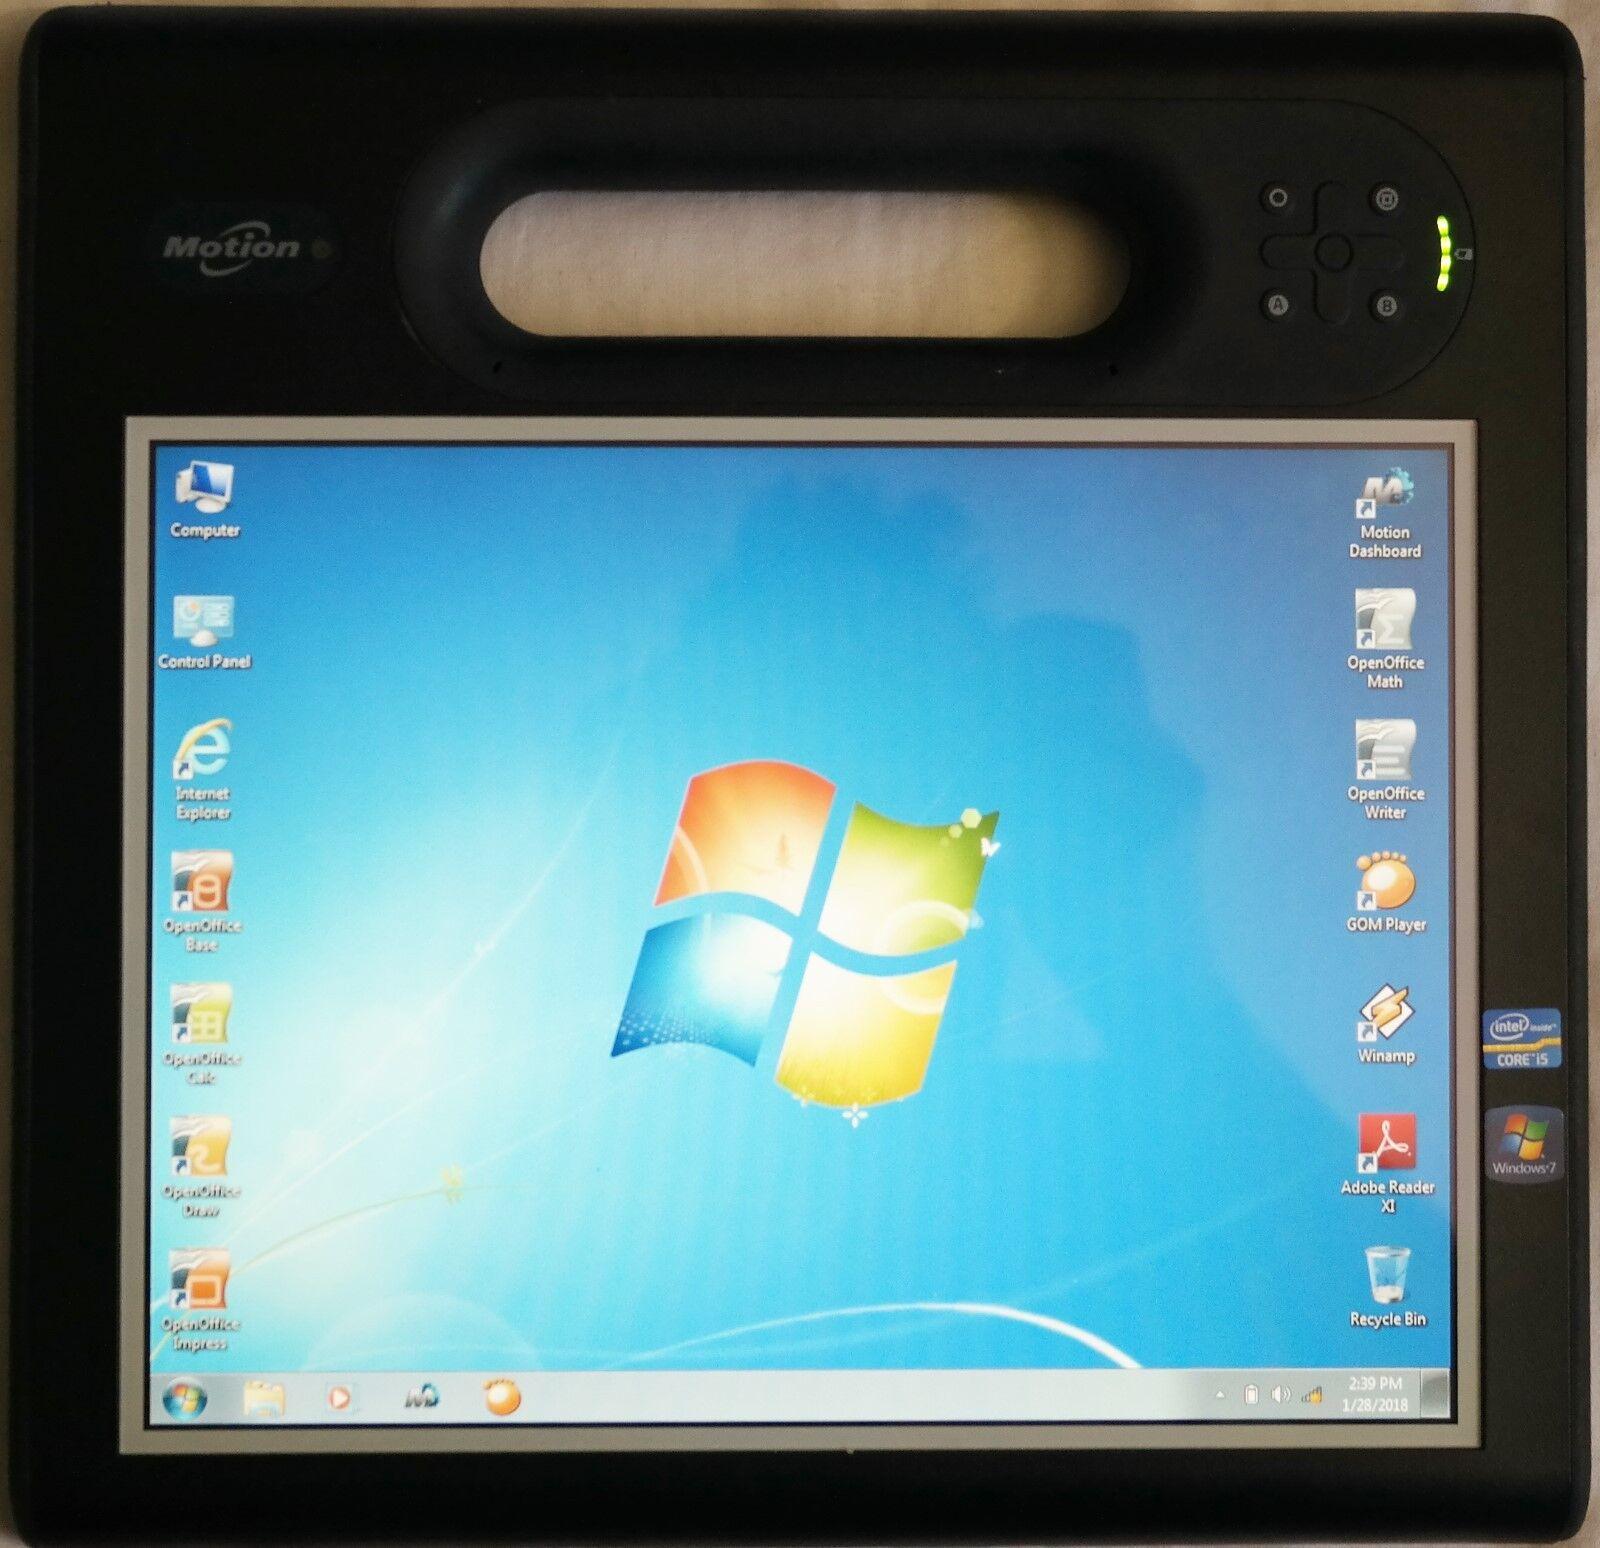 Motion Computing F5T Core i5 1.8GHz-(2.27Hz) 4GB 128GB SSD Touch Screen LCD Gobi